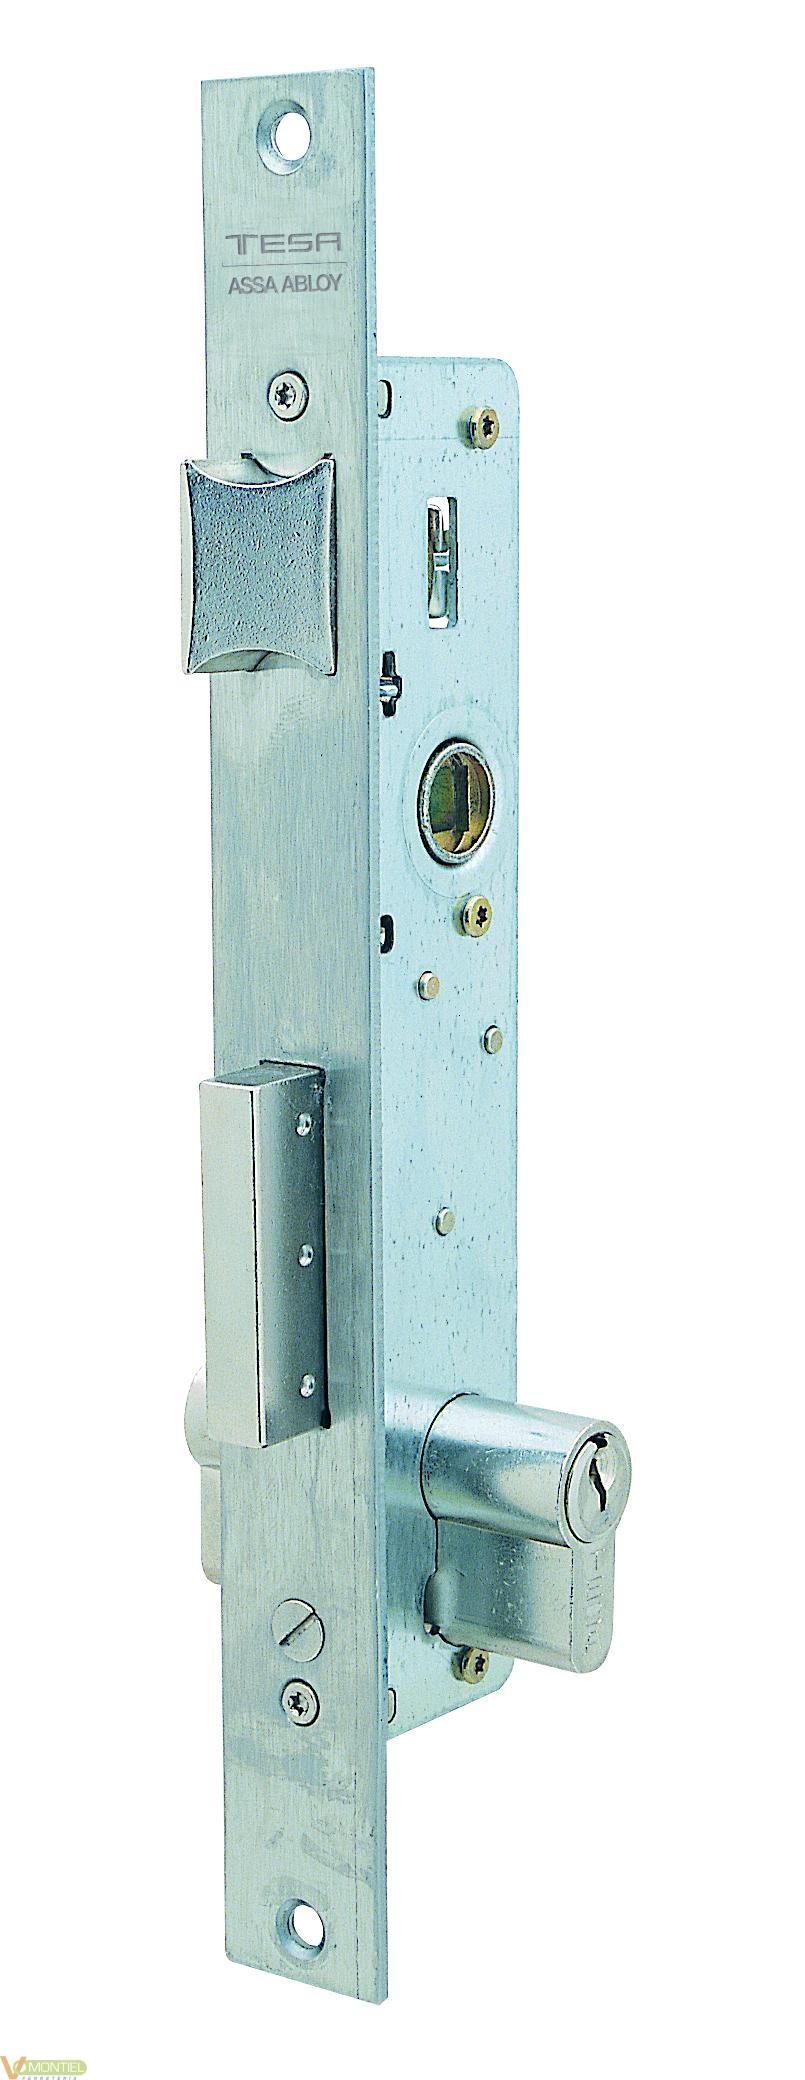 Cerradura pic/pa.bas. 25x20mm-0